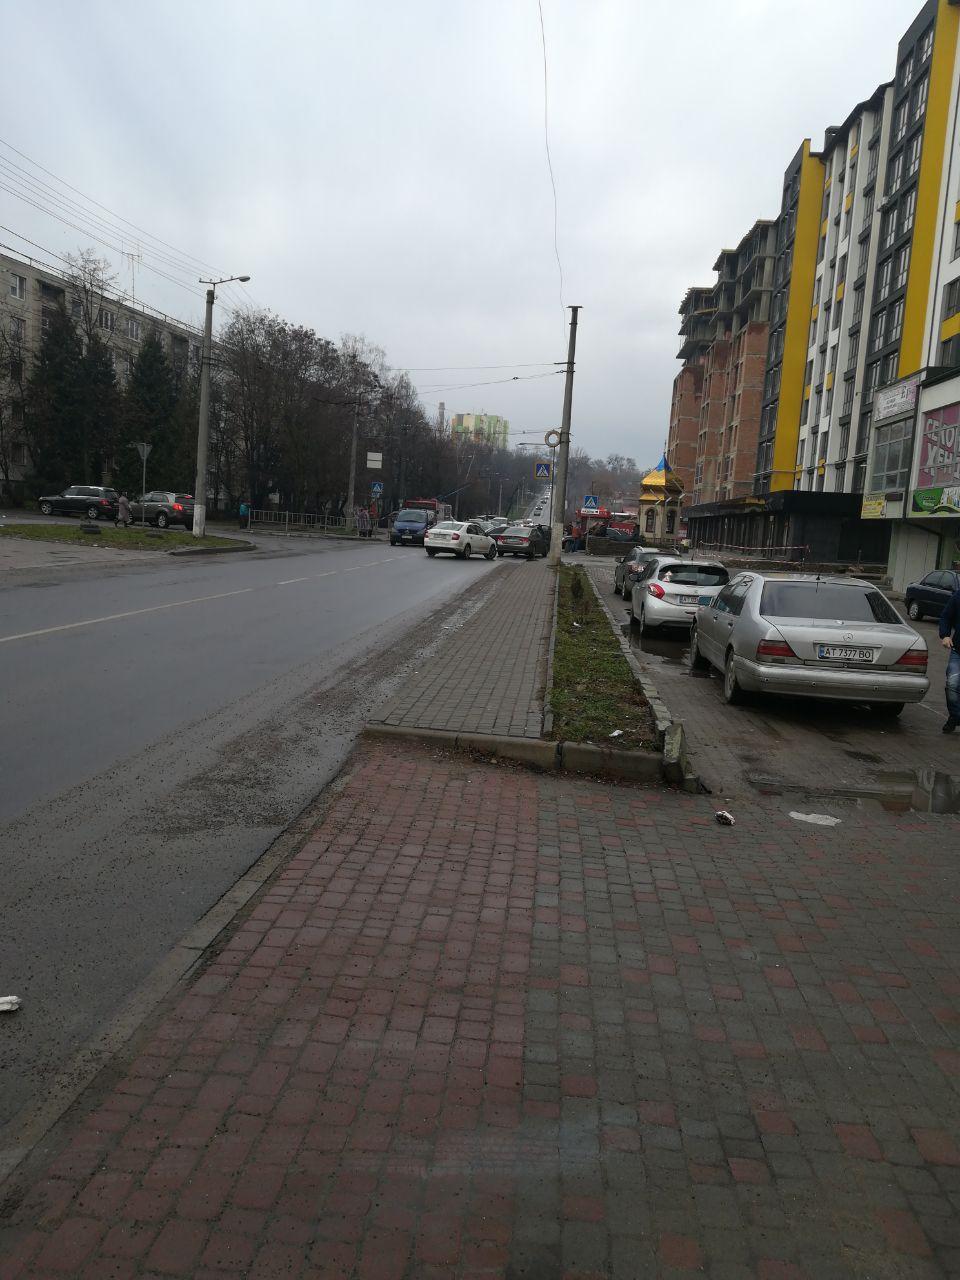 http://galka.if.ua/app/uploads/2018/12/photo5217710907986127409.jpg